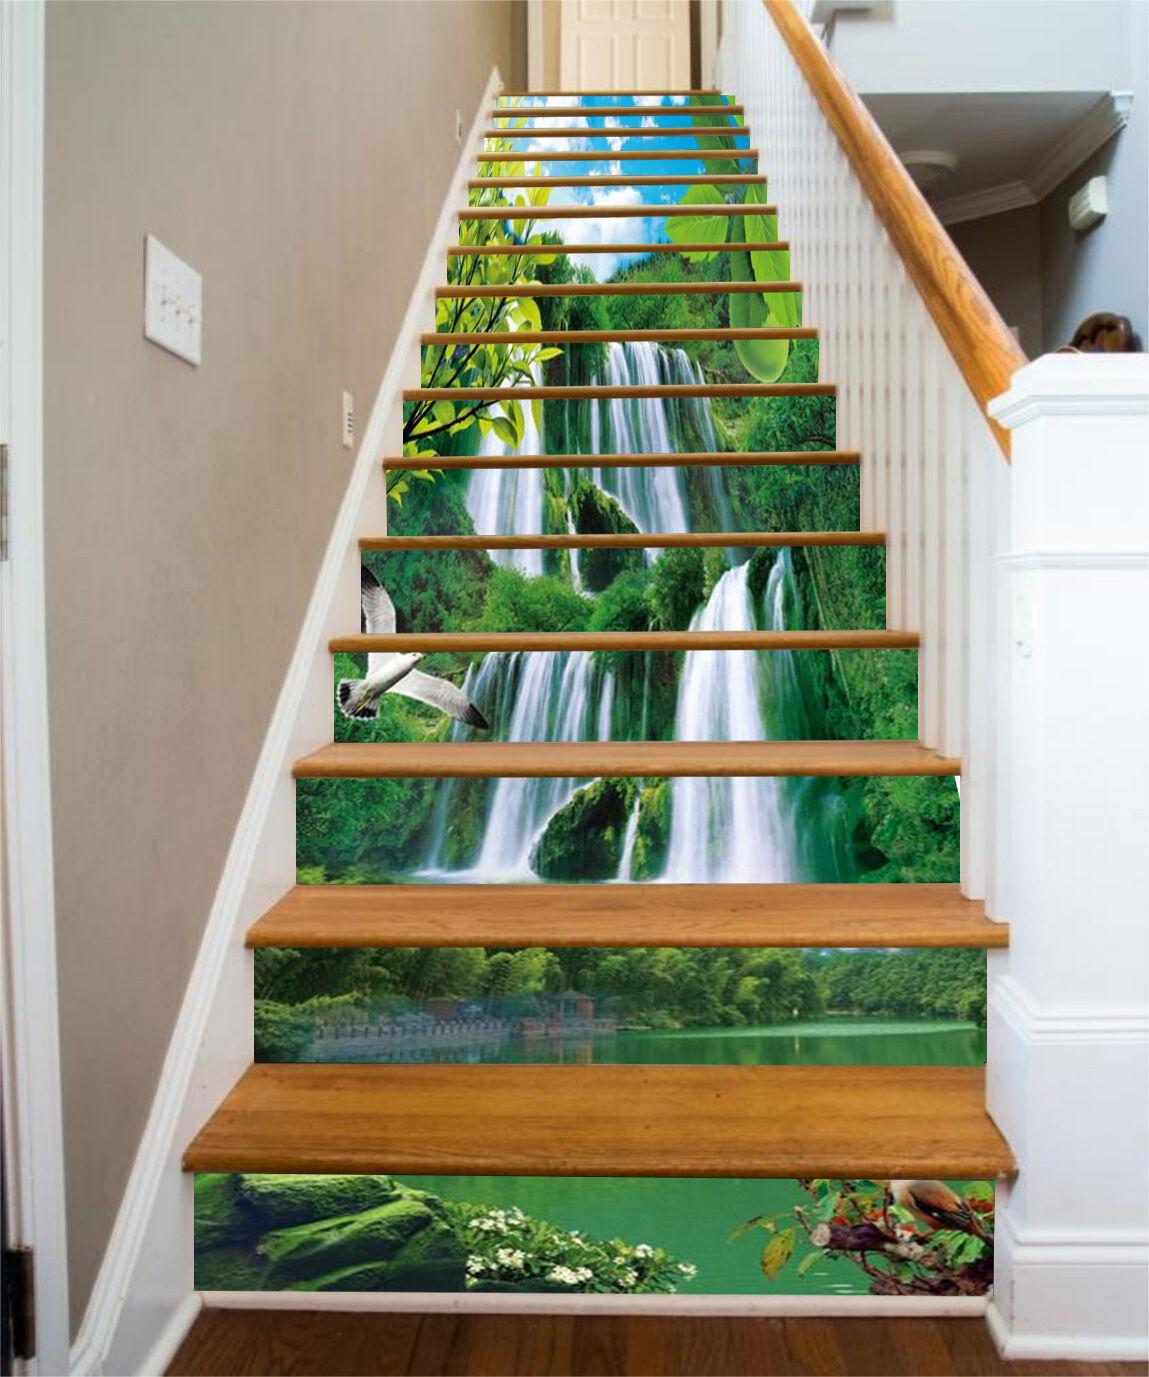 3D Waterfall 724 Stair Risers Decoration Photo Mural Vinyl Decal Wallpaper CA